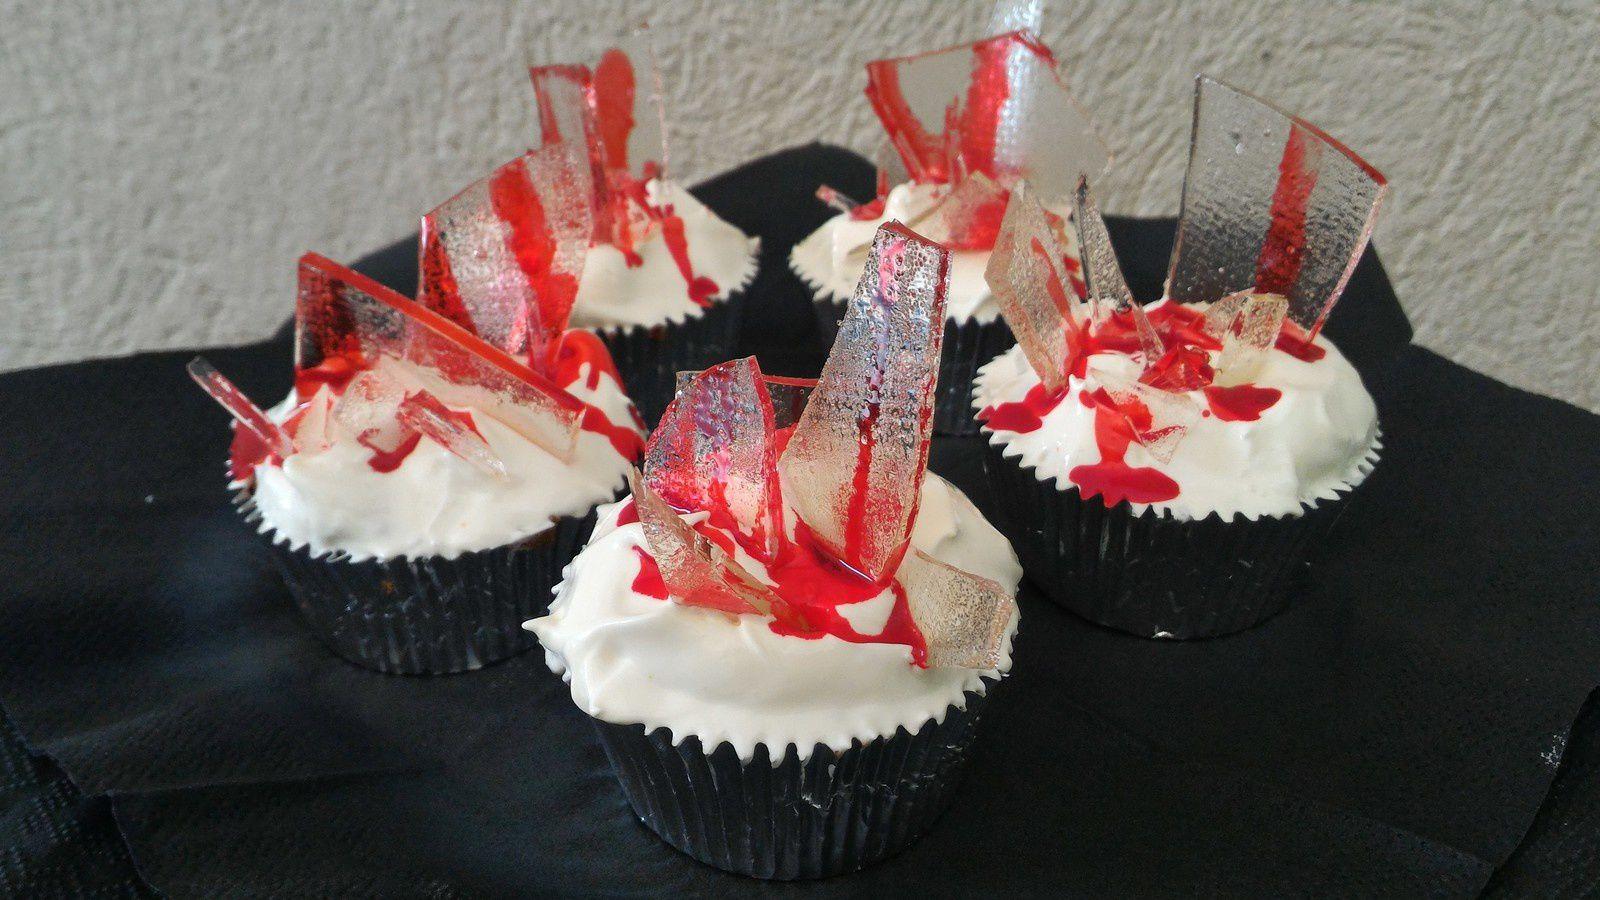 BLOODY CAKE HALLOWEEN